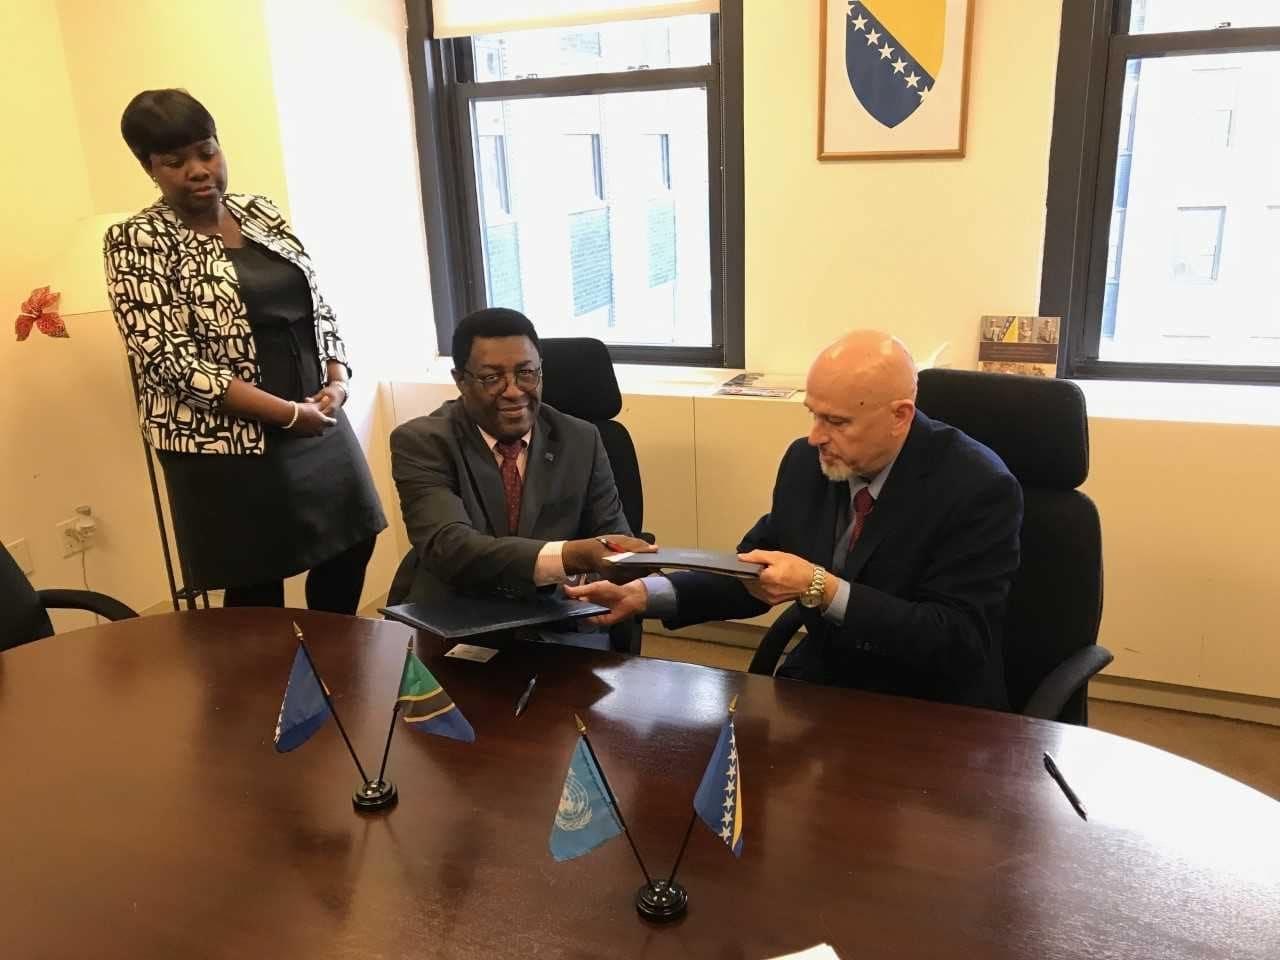 Bosnia and Herzegovina established diplomatic relations with Tanzania